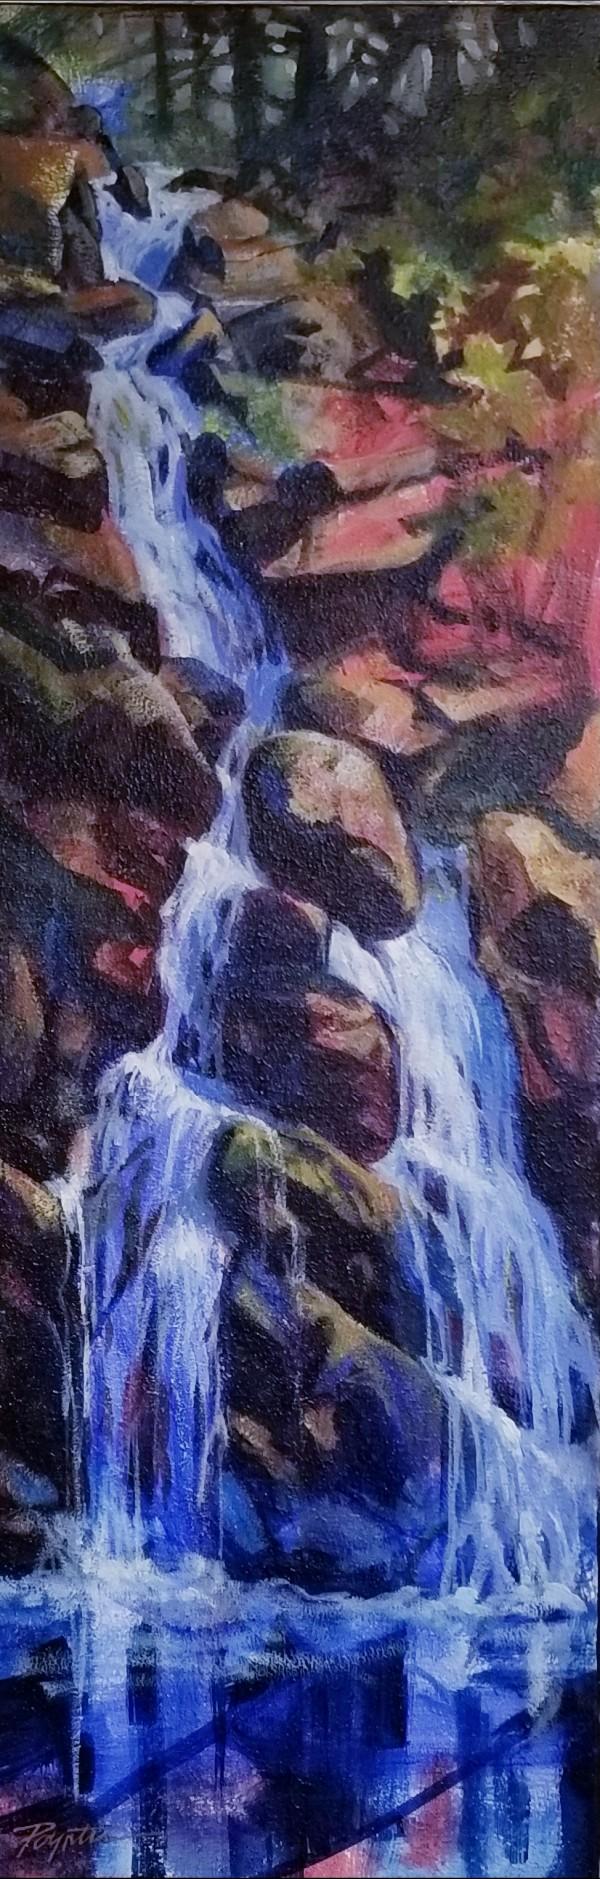 Waterfall series by Jan Poynter